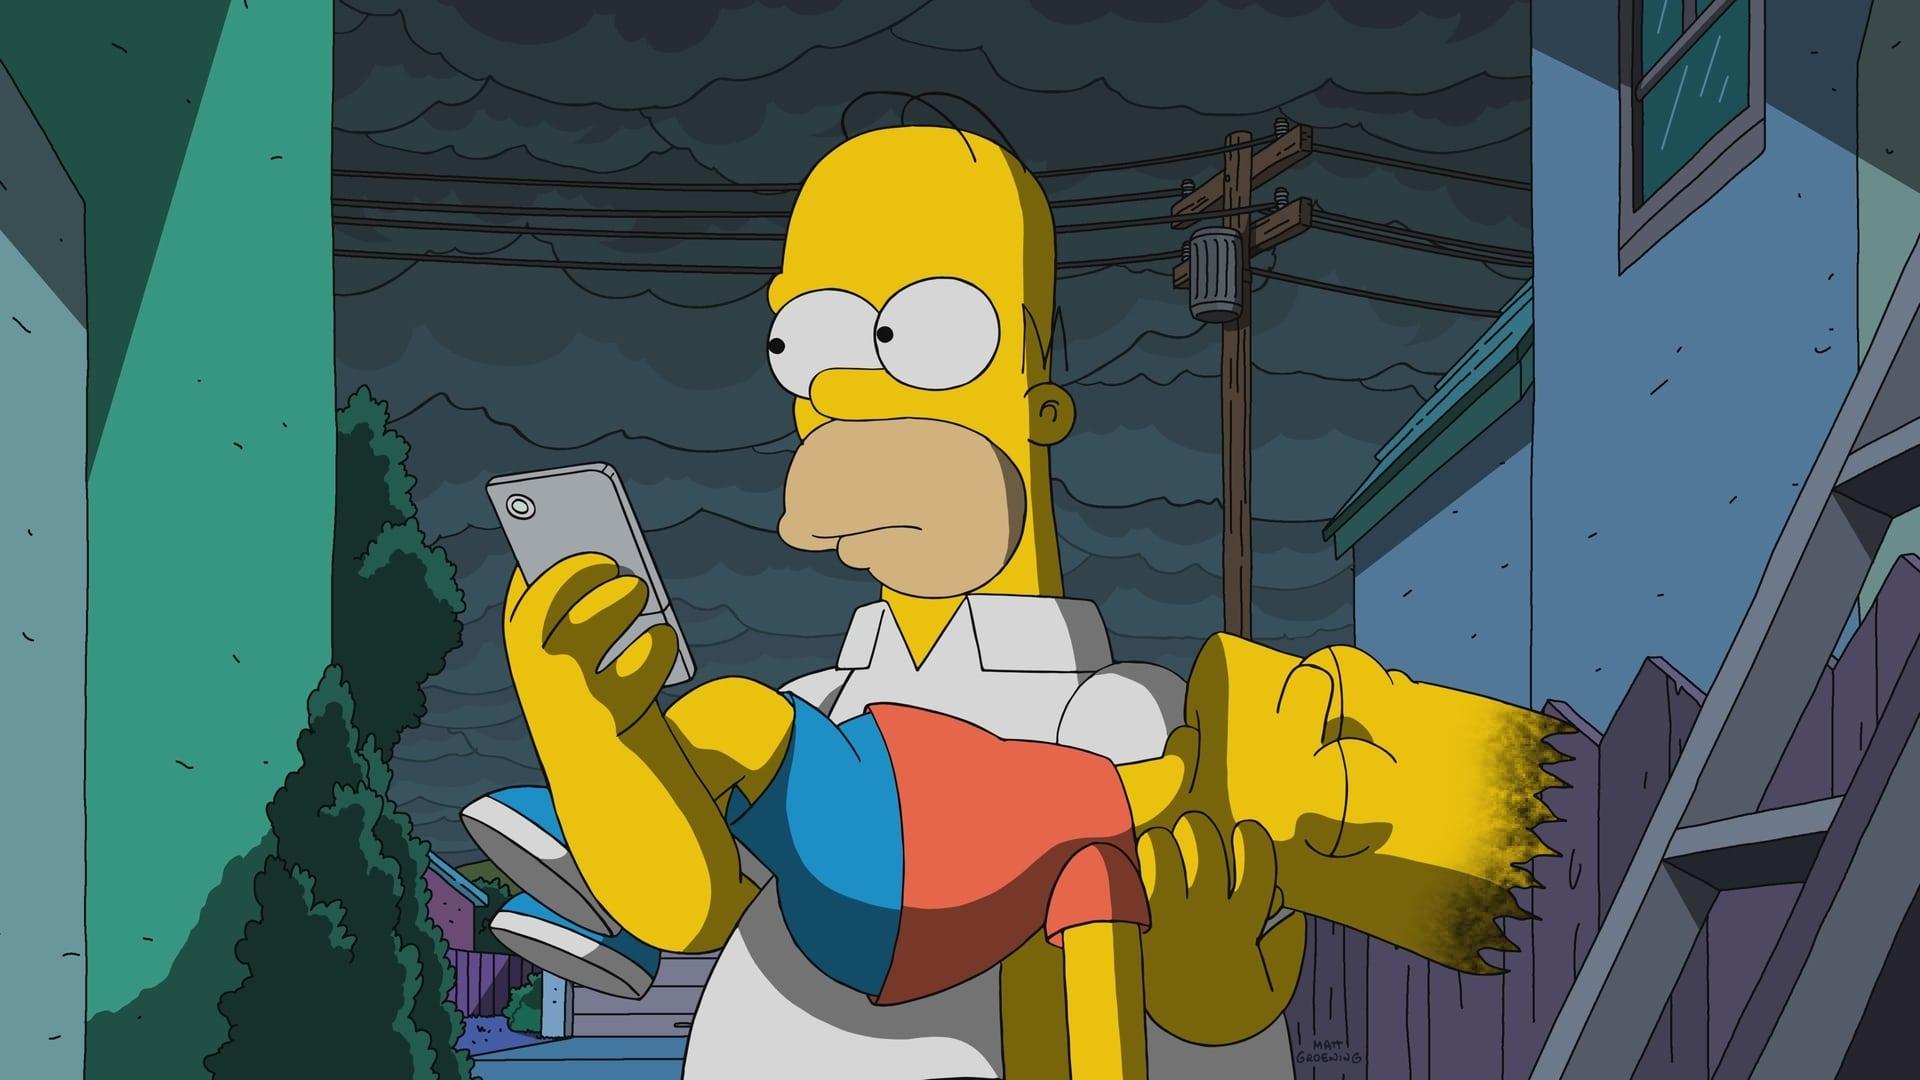 The Simpsons - Season 29 Episode 21 : Flanders' Ladder